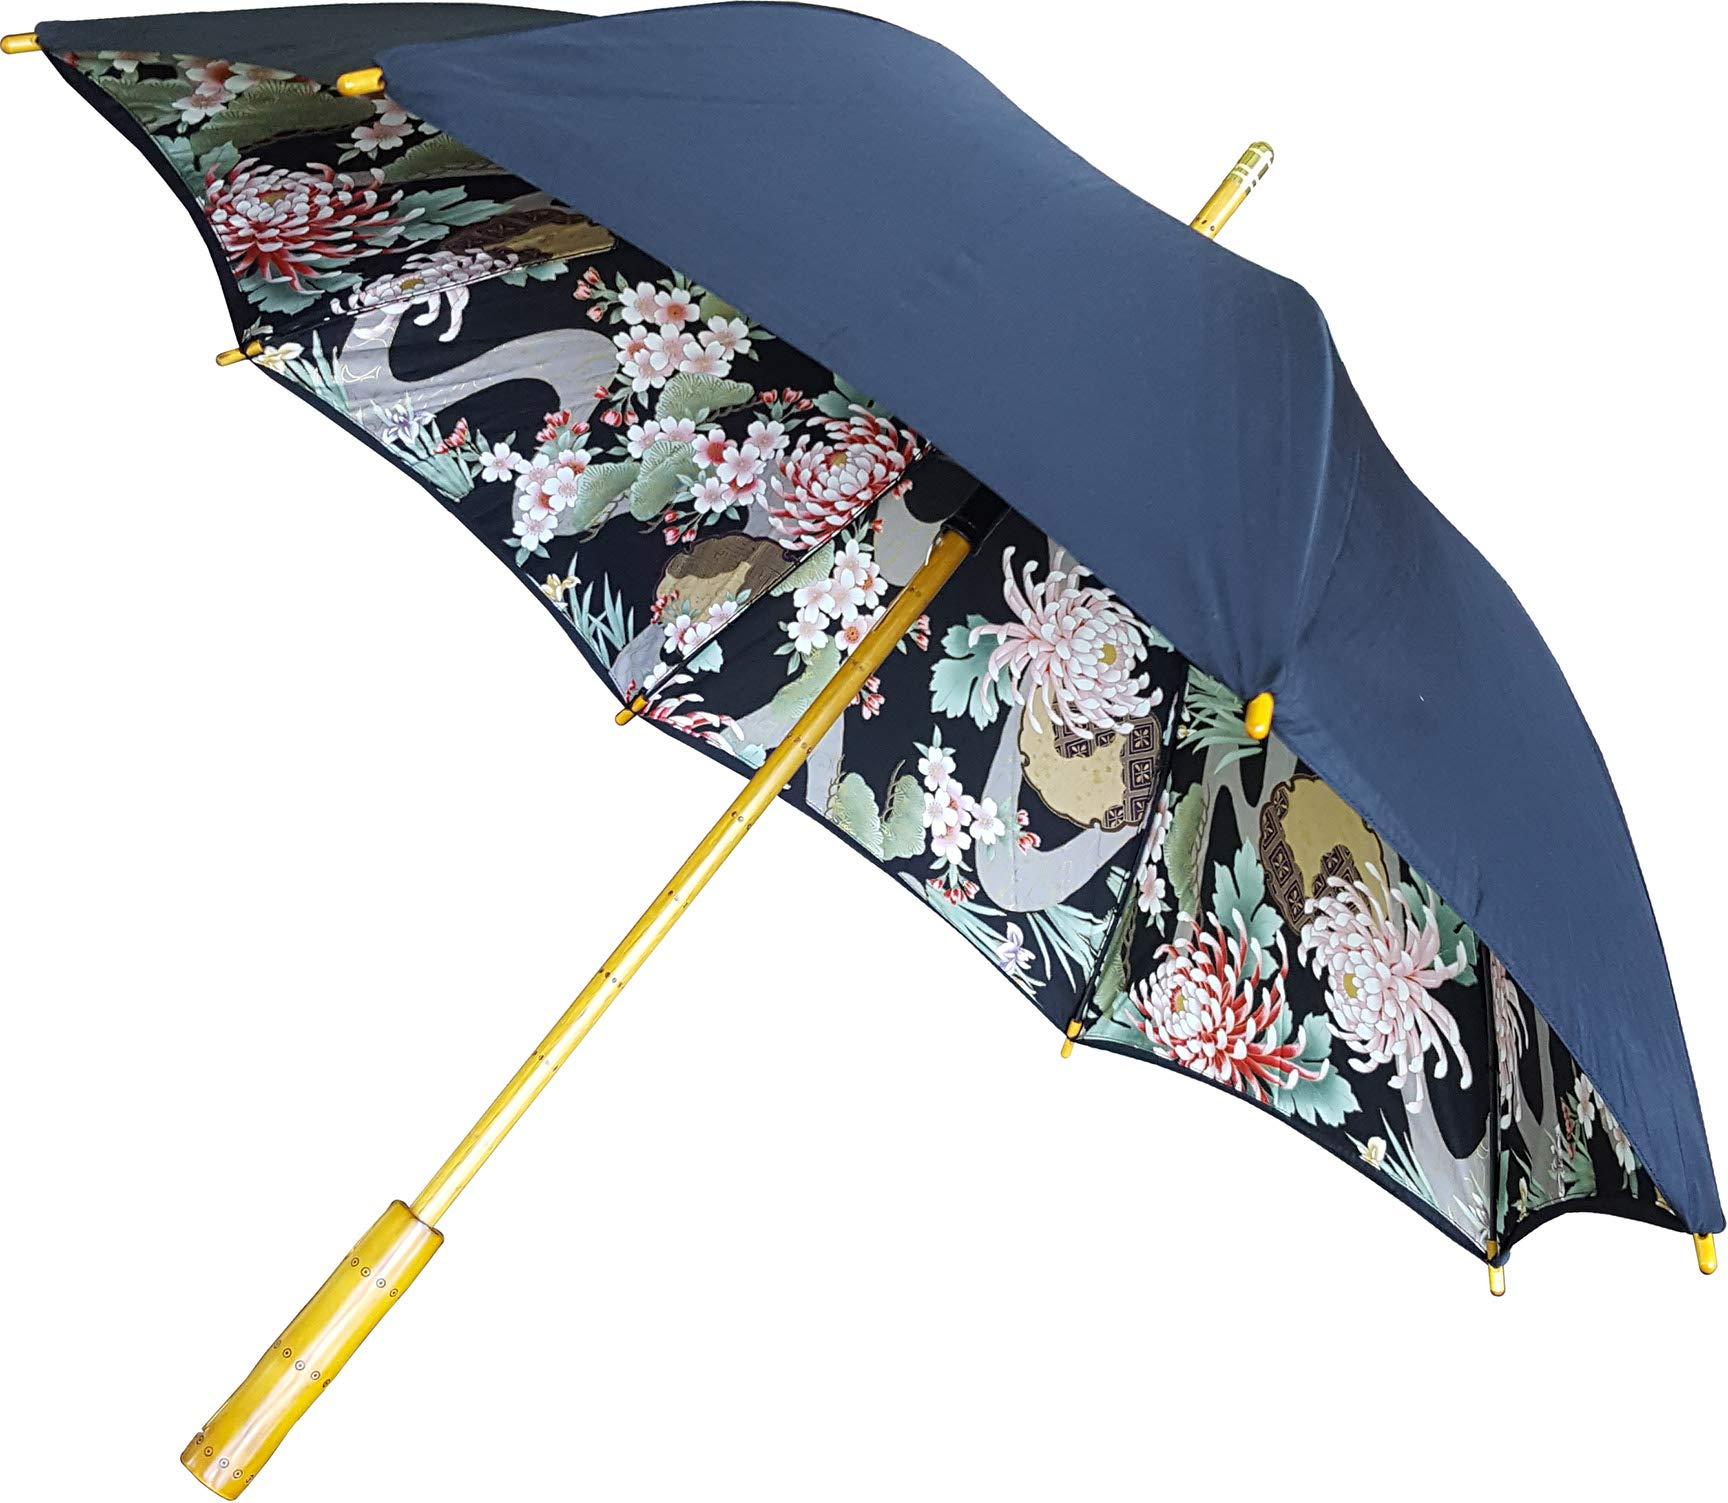 Umbrellas Hawaii - Sun Protection UPF 50+ (Tan Tropical) by Umbrellas Hawaii (Image #1)